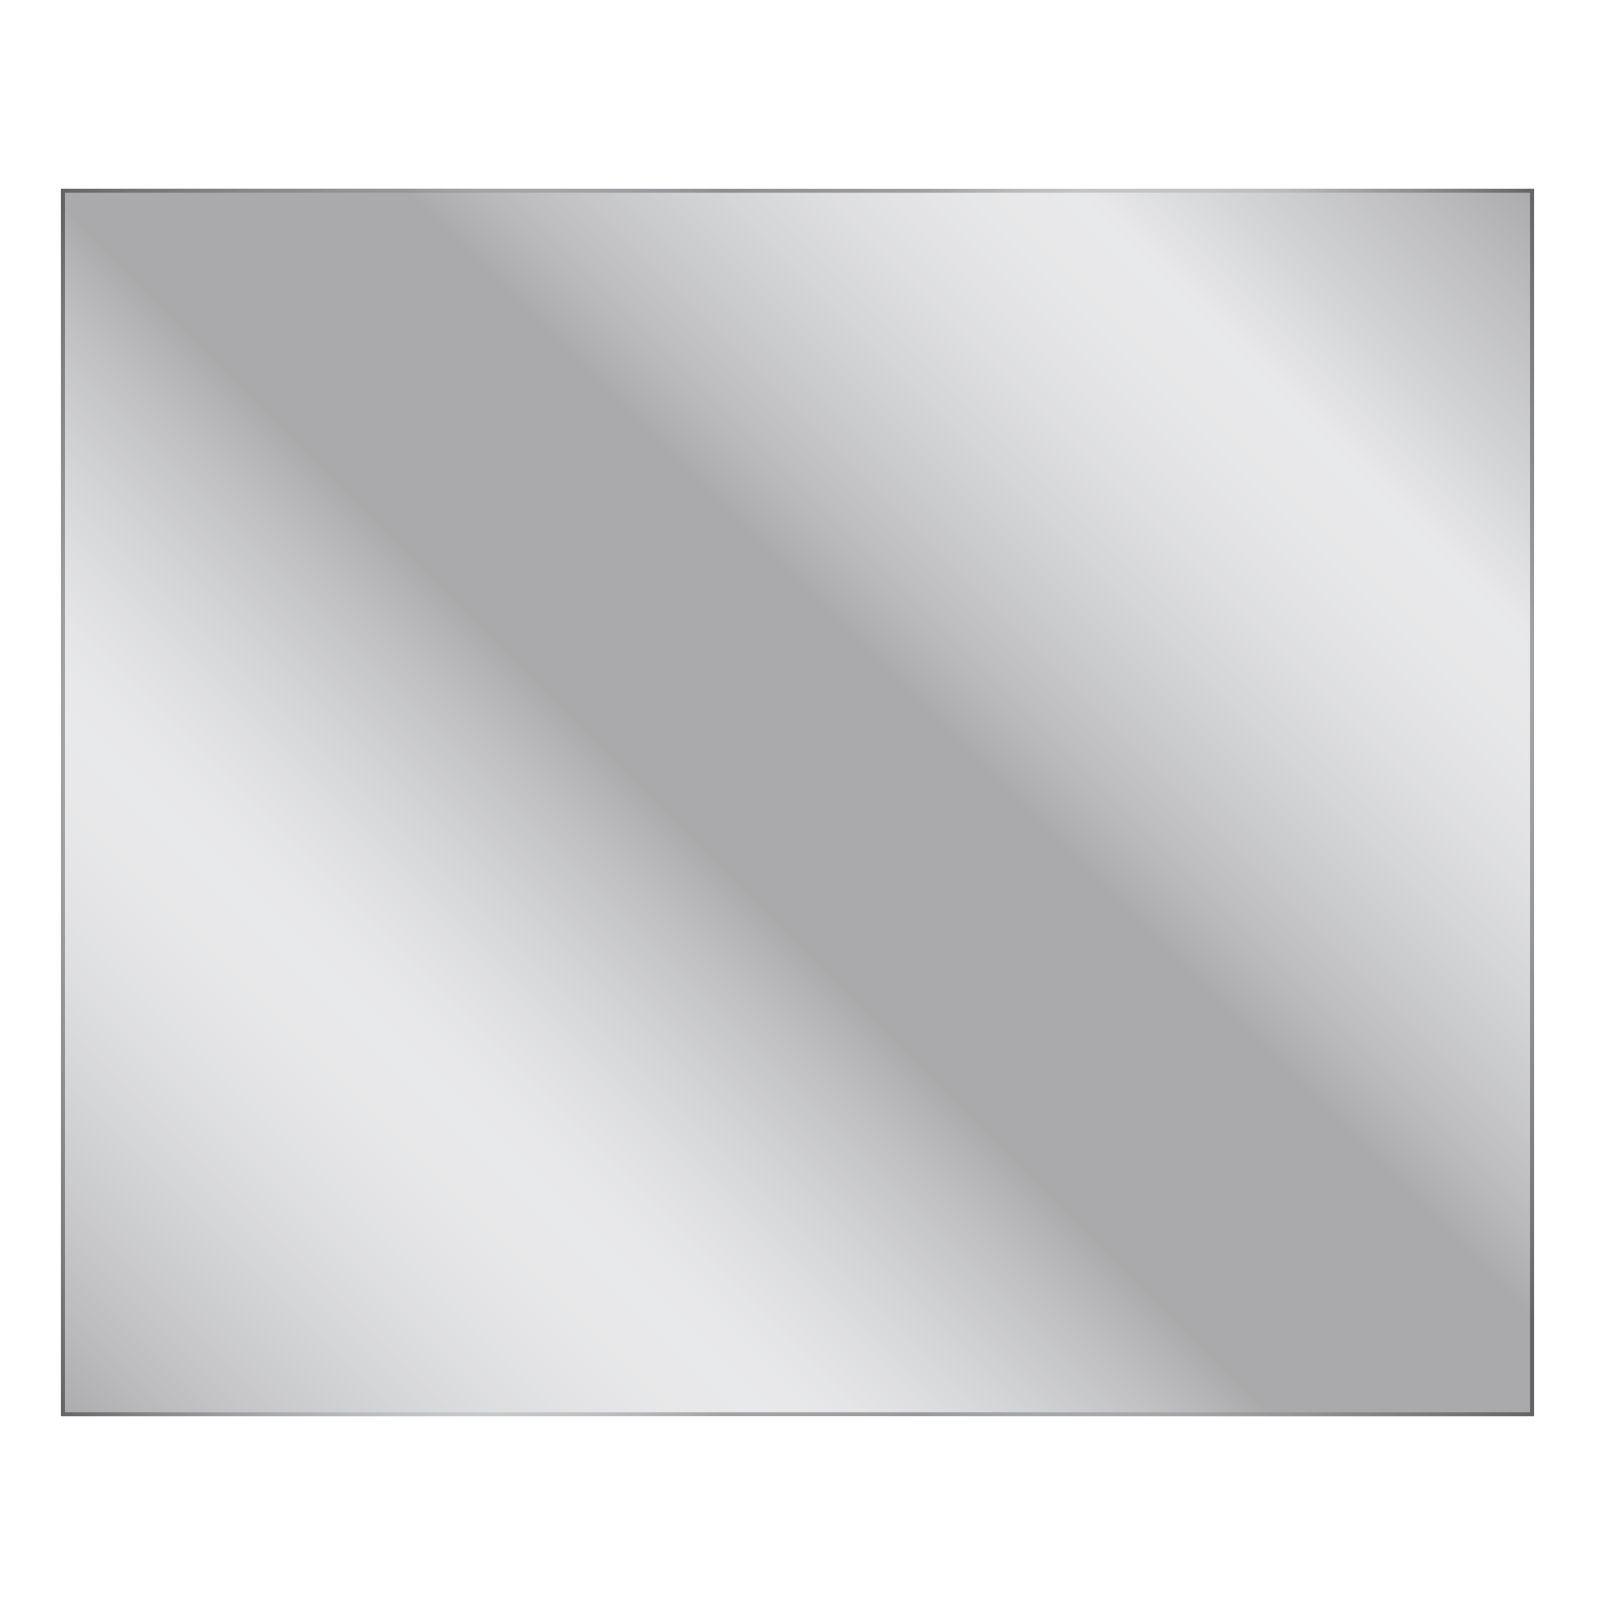 Living Elements 750 x 900 x 5mm Flat Edge Mirror